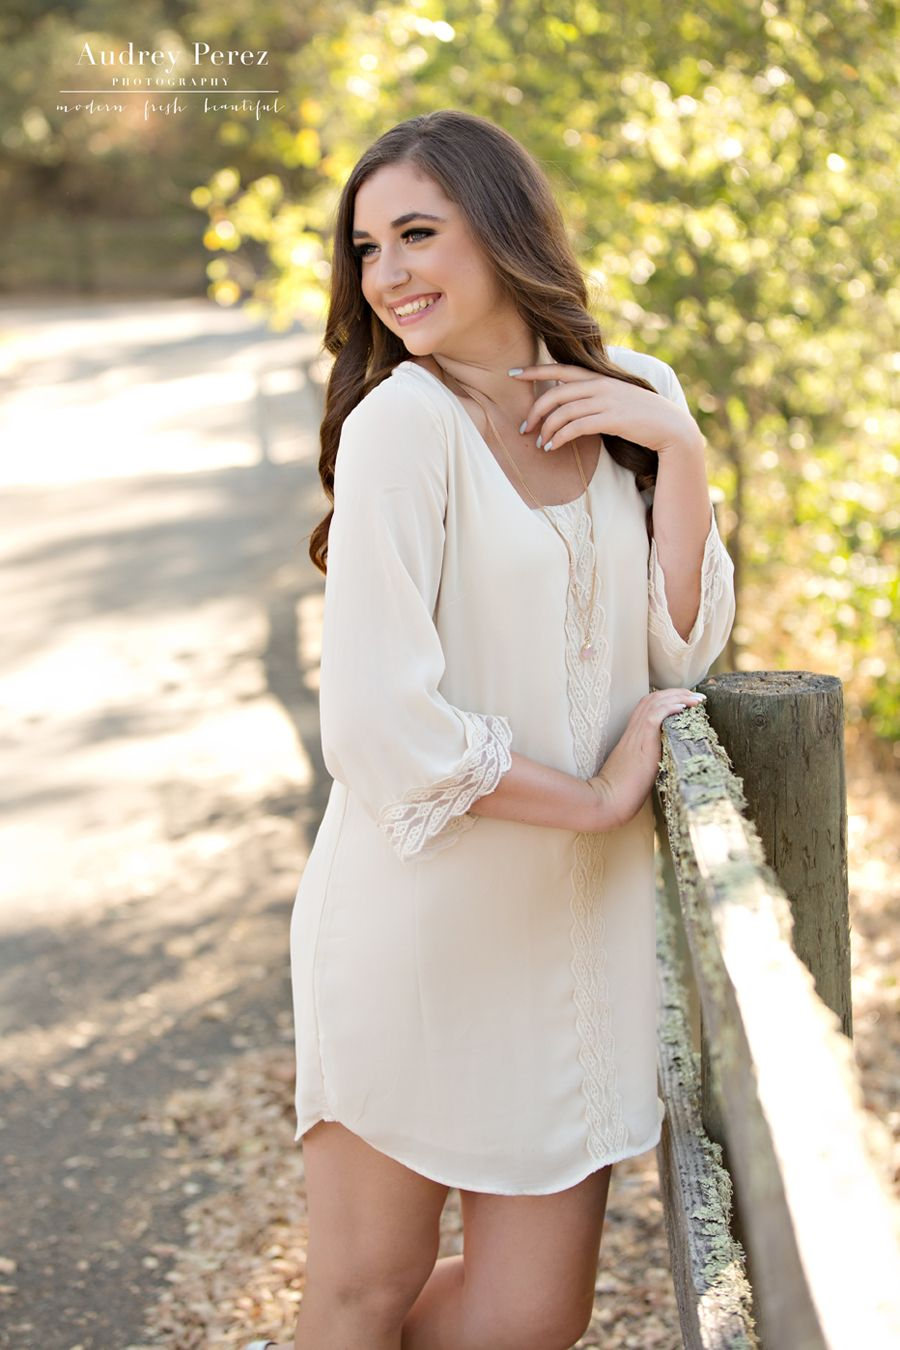 abby is a senior at vista del lago high where she is a